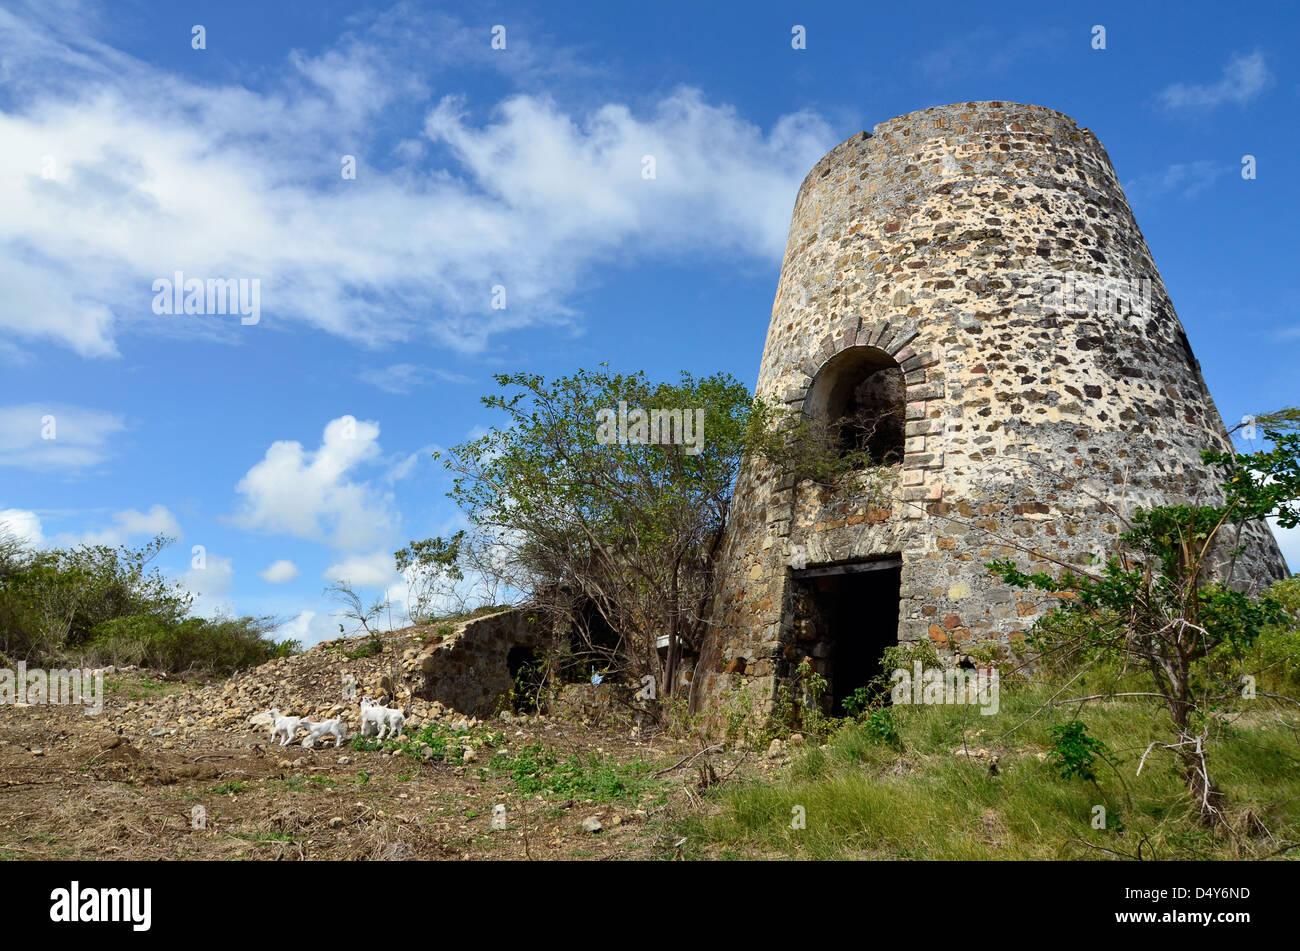 Ruins of an old sugar mill at Watcho Beach, St. Croix, U.S. Virgin